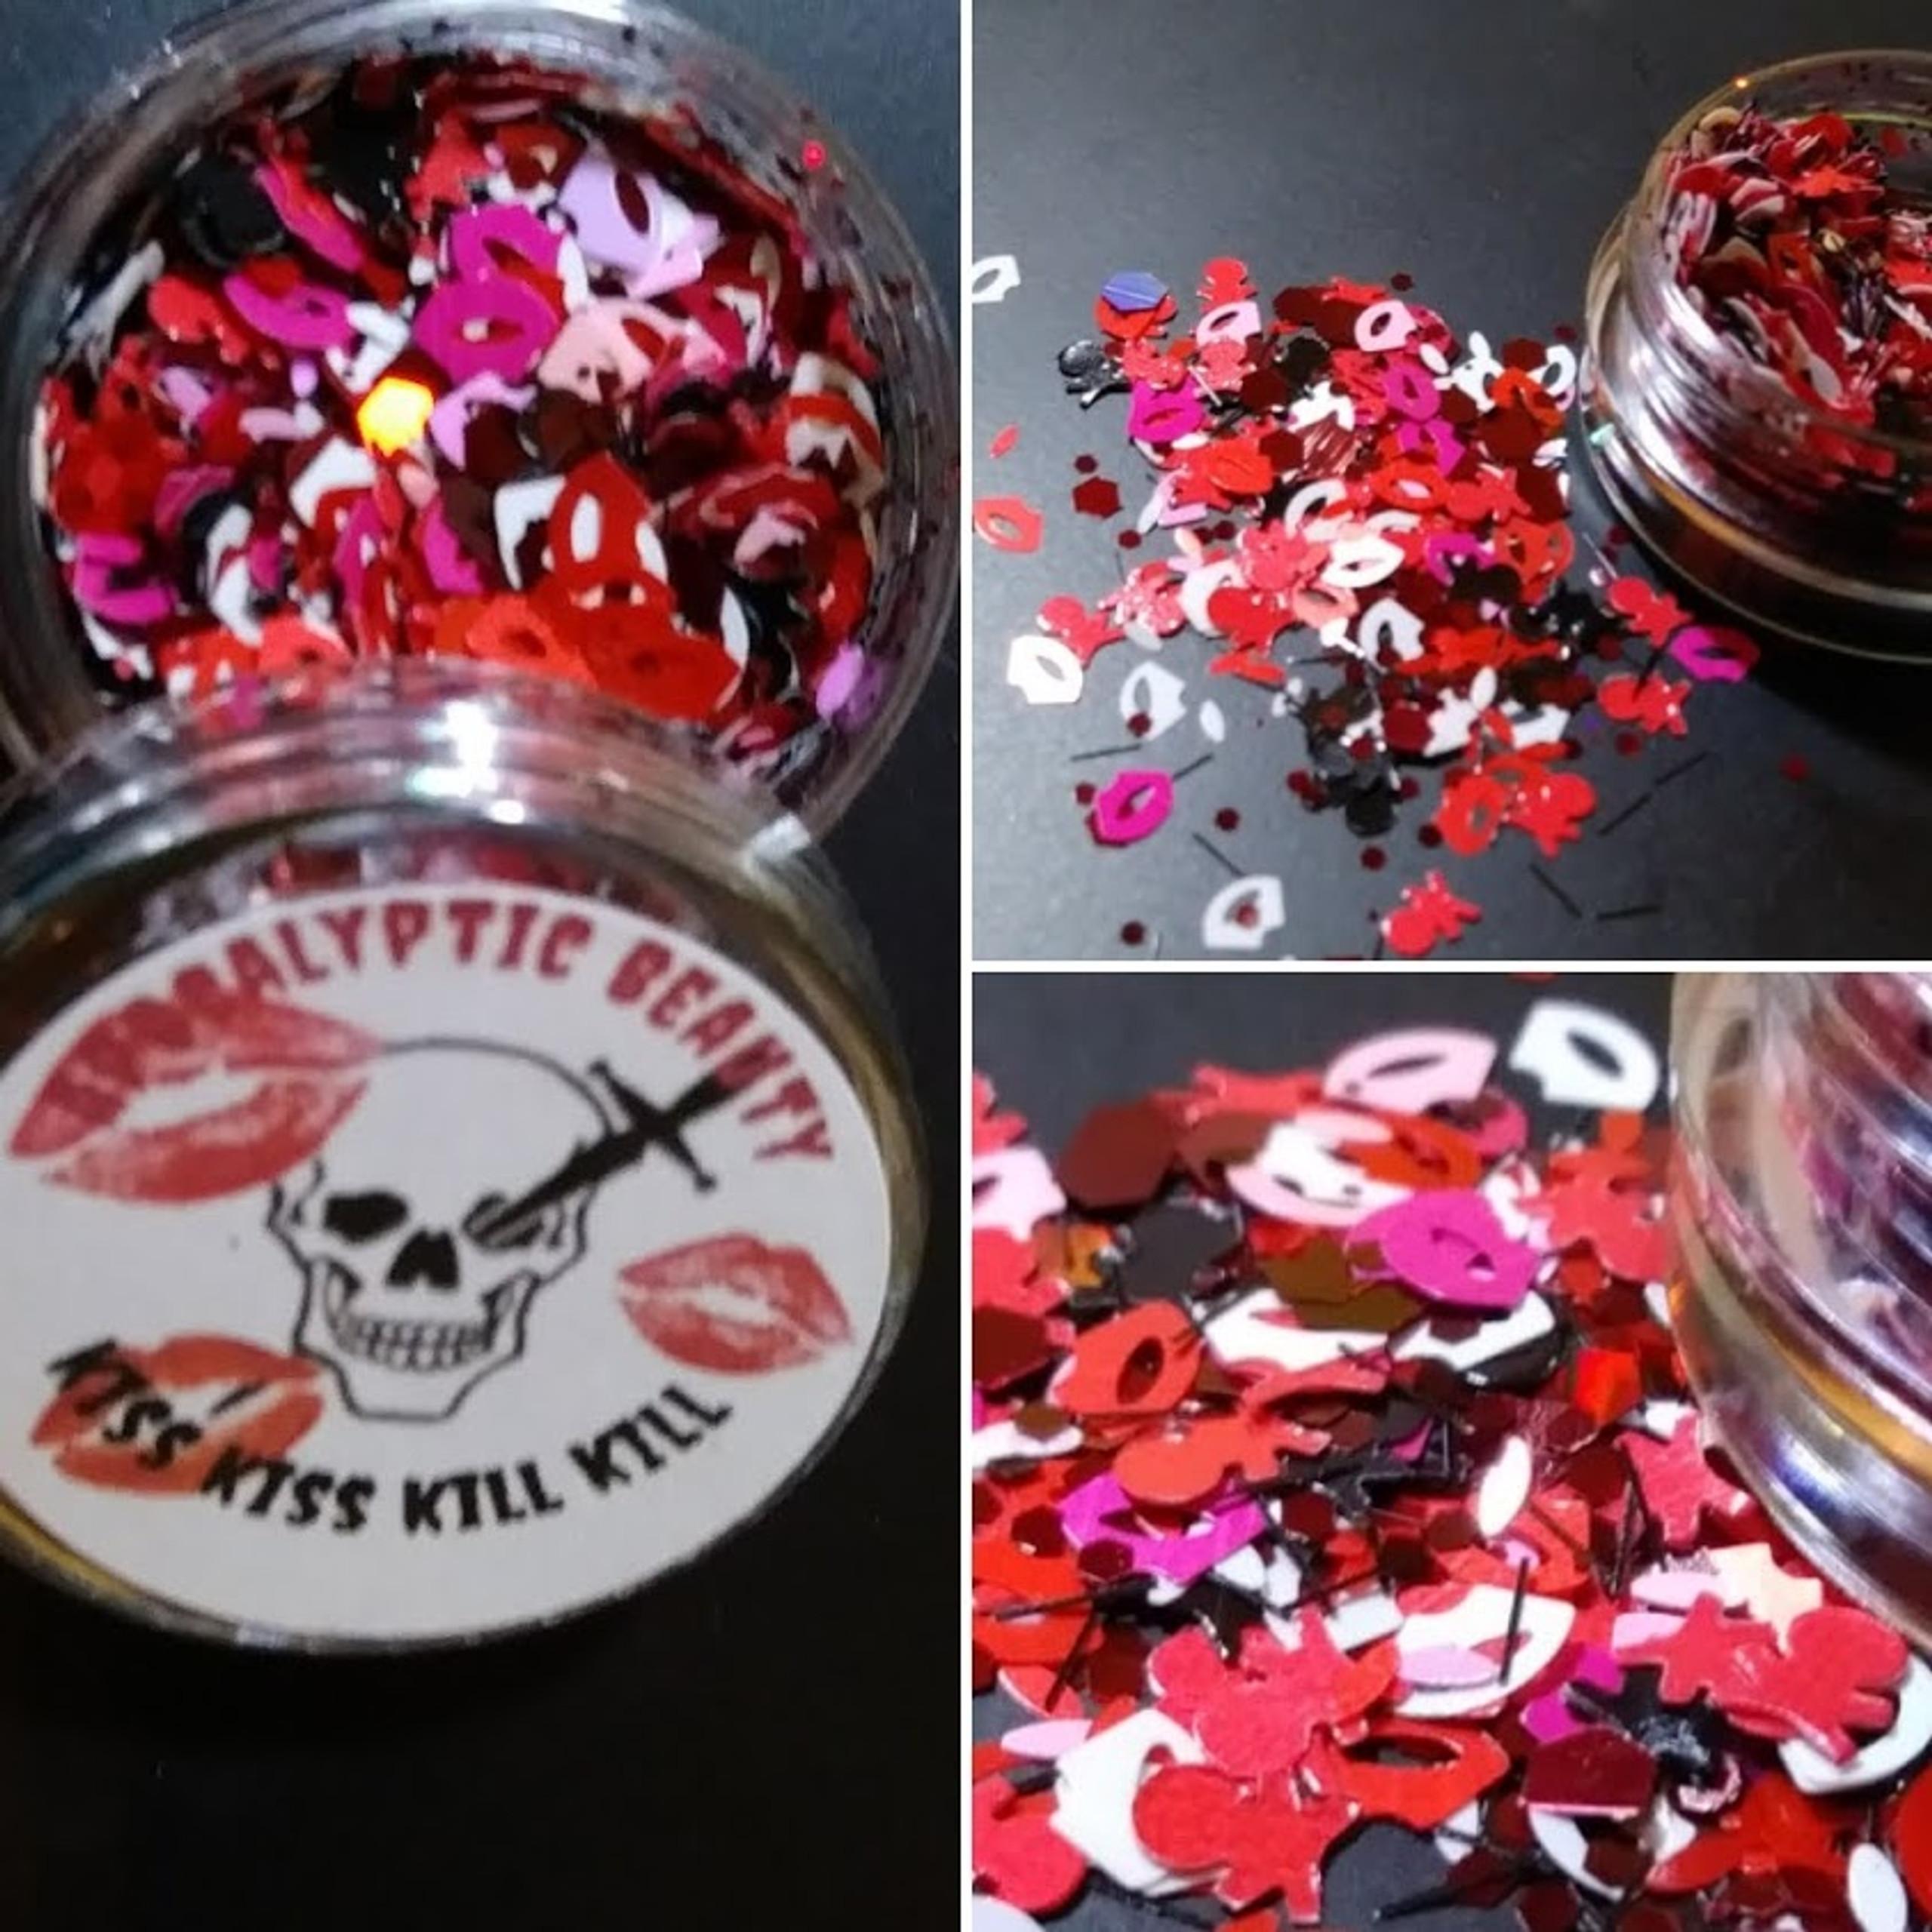 Kiss Kiss Kiss Kill Kill (LE) - kisses and skulls chunky glitter blend